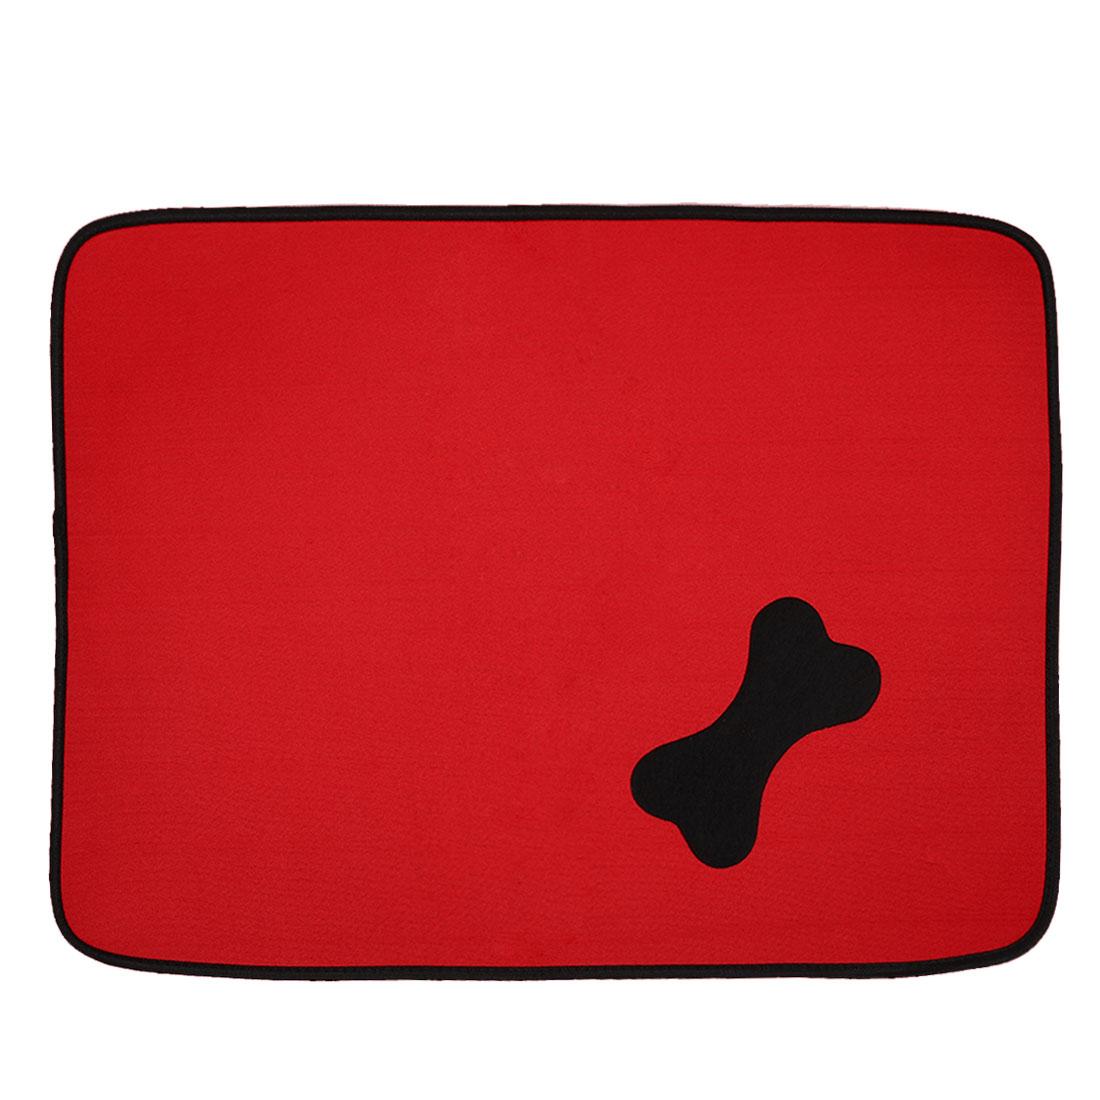 Dog Nylon Rectangle Design Bone Pattern Anti Slip Pad Mat Doormat Red 78 x 60cm